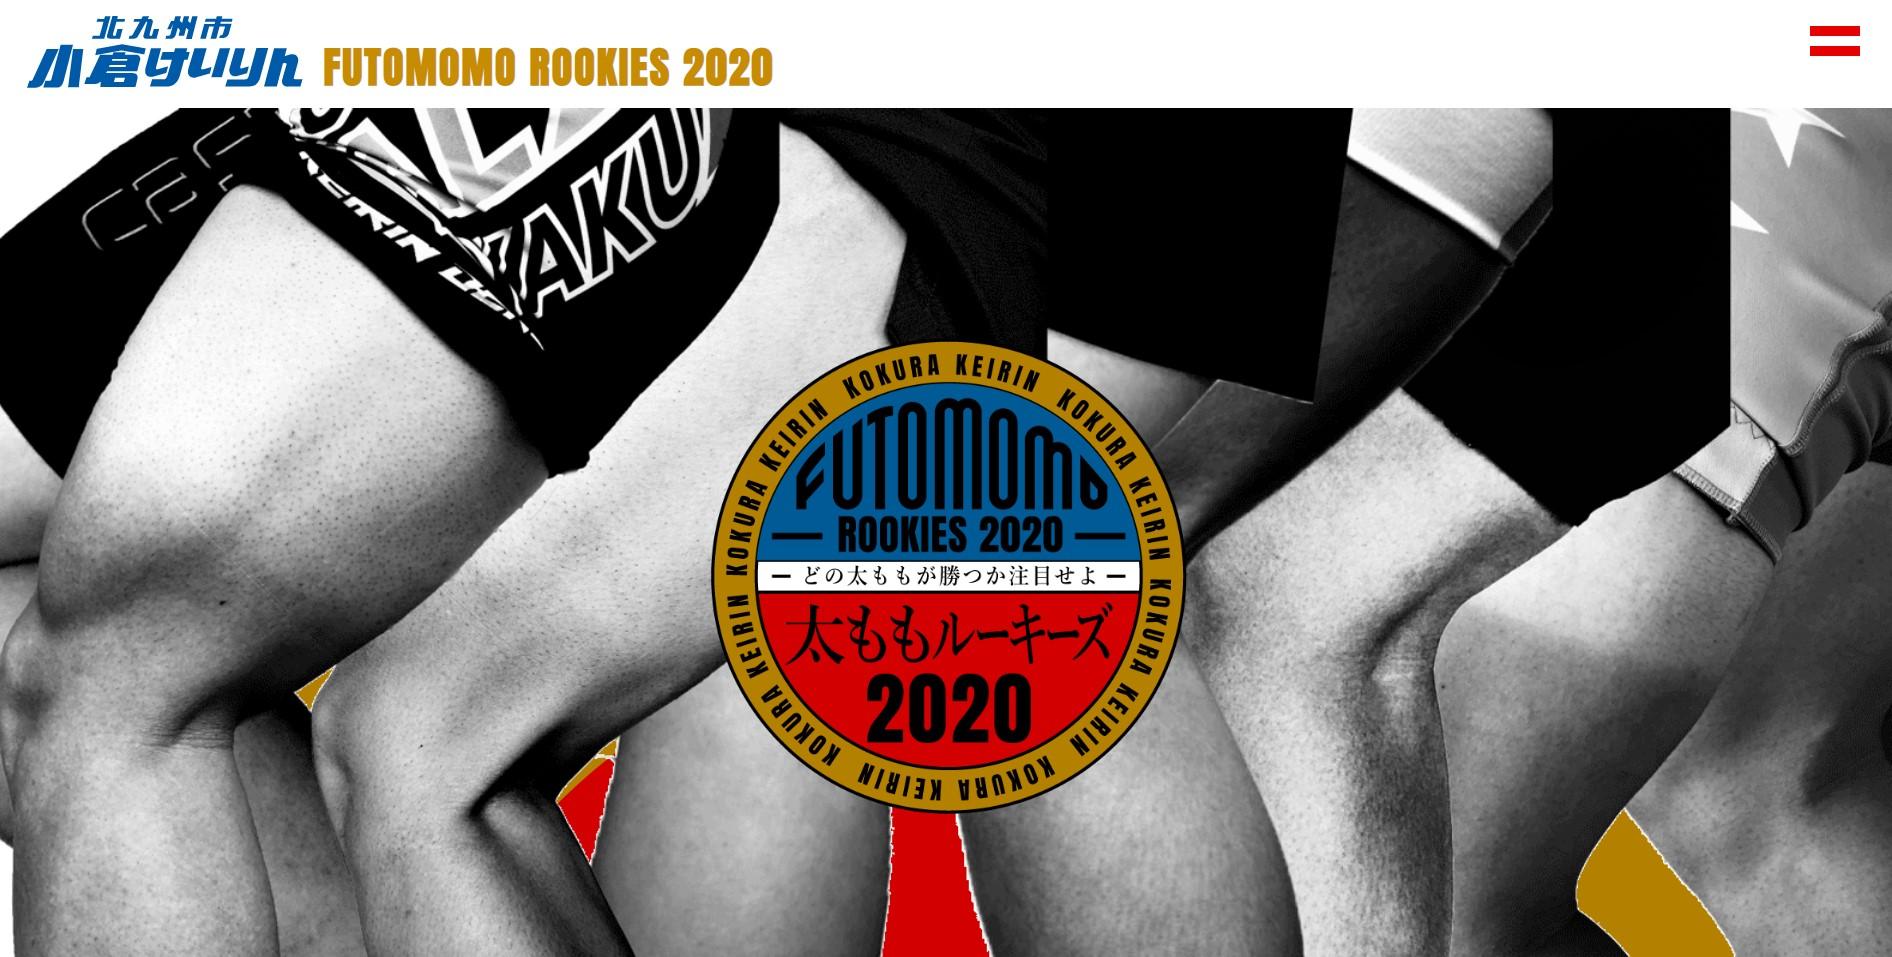 小倉競輪 ルーキーシリーズ2020